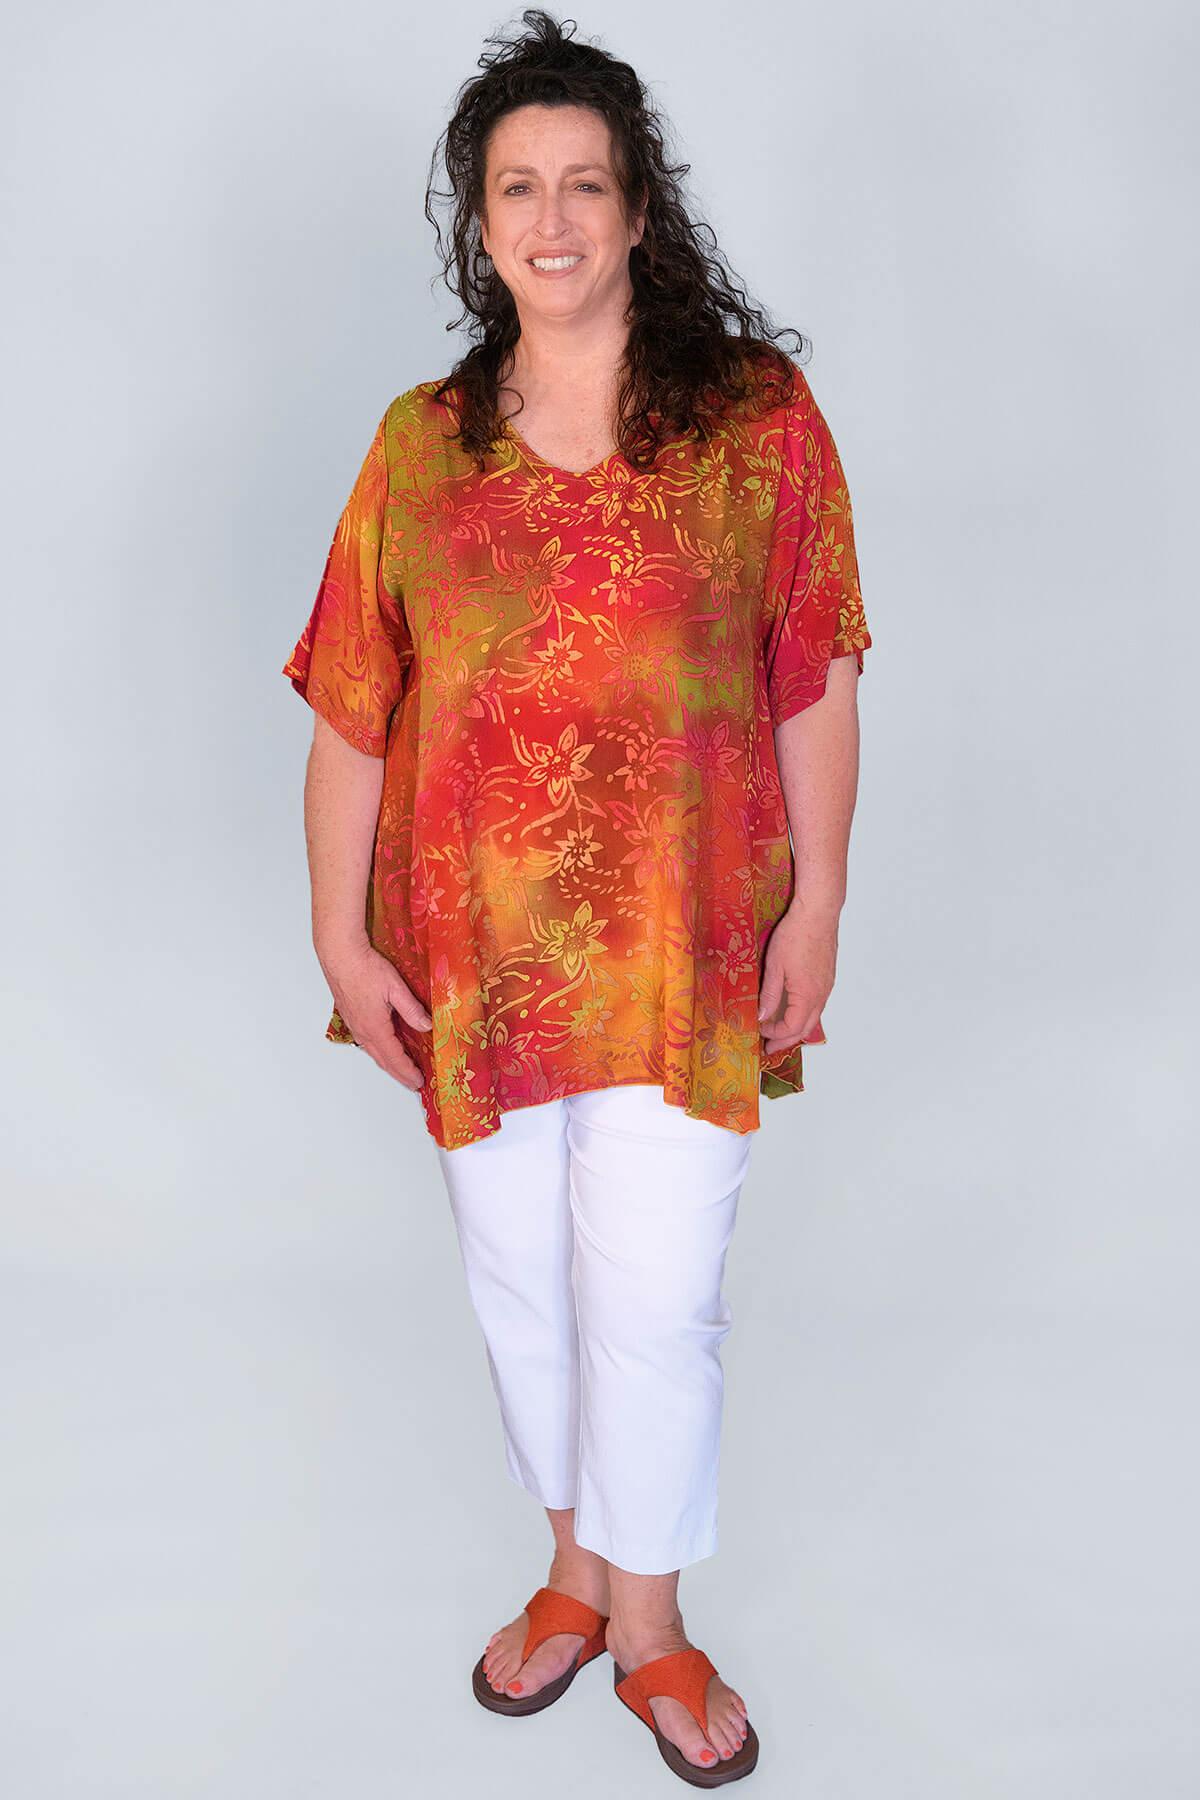 Angel Circle swing pattern t-shirt